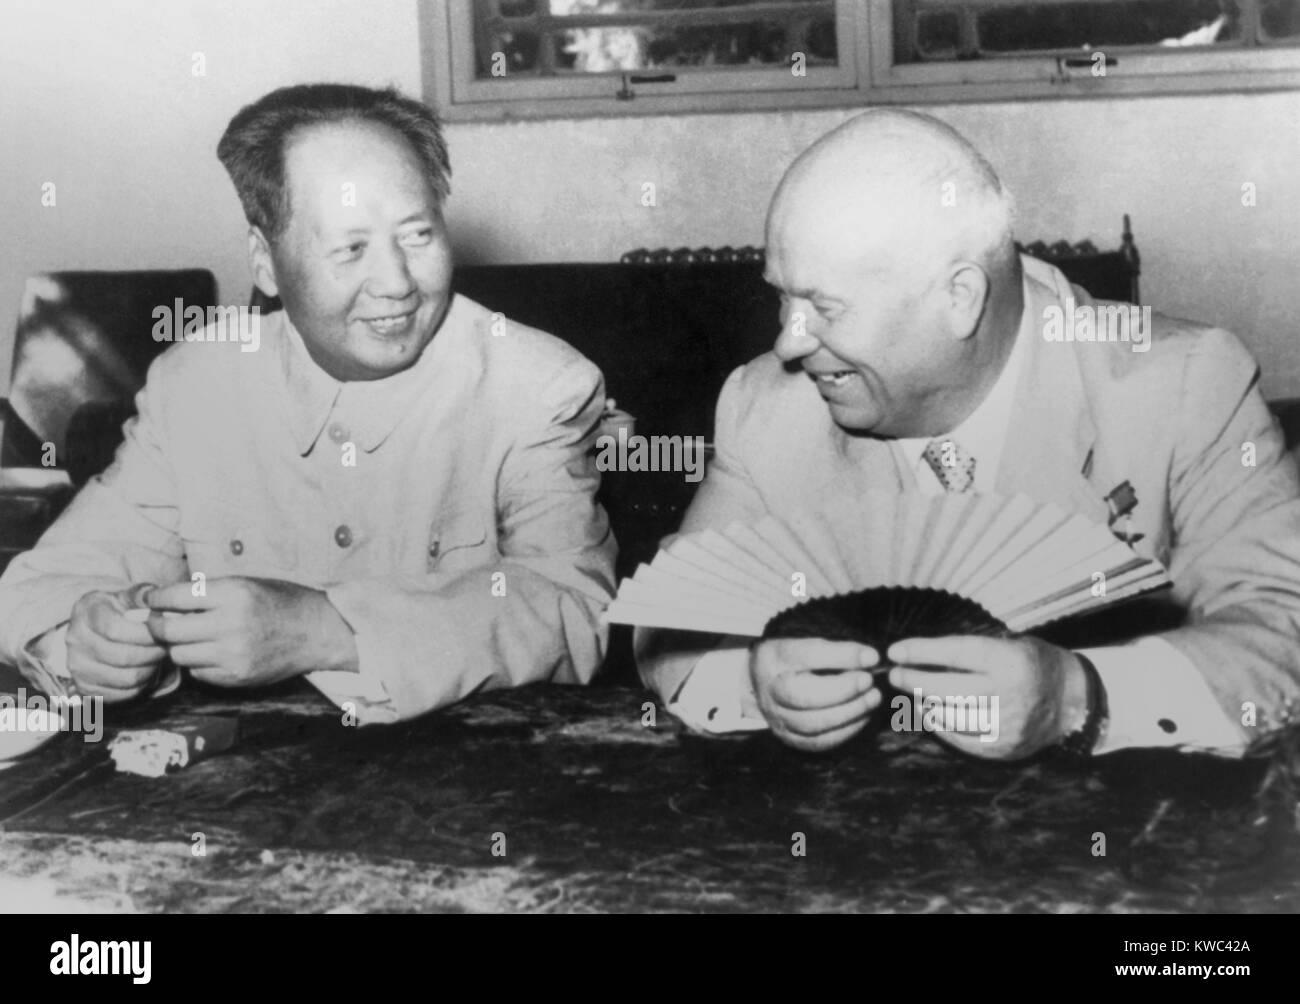 Mao Tse-tung and Nikita Khrushchev, during the Soviet Russian leader's visit to Peking (Beijing). Aug. 11, 1958. - Stock Image